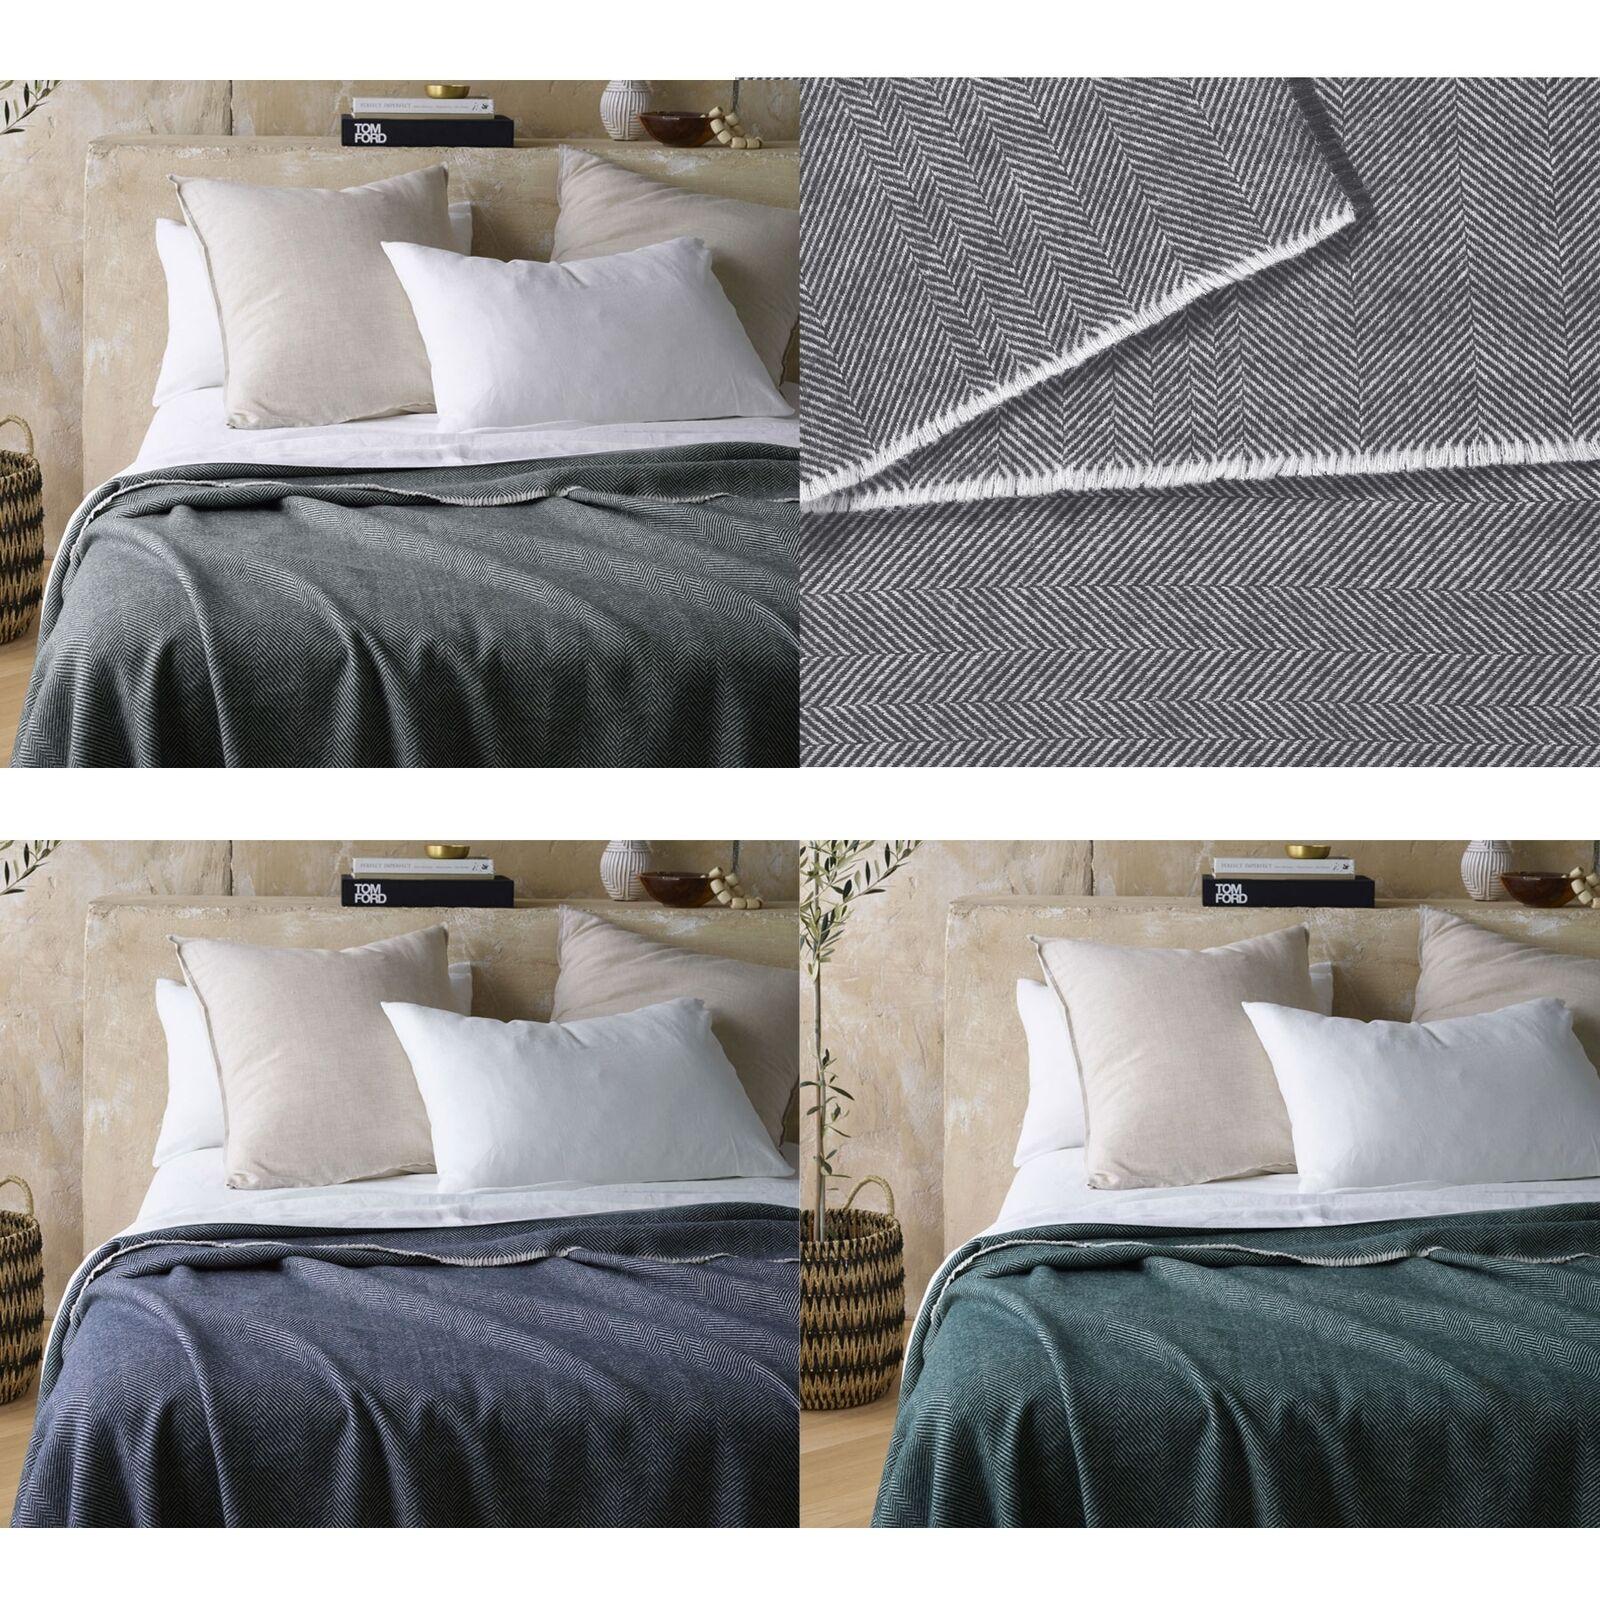 400gsm Herringbone Wool Blanket by Accessorize - SINGLE DOUBLE QUEEN KING